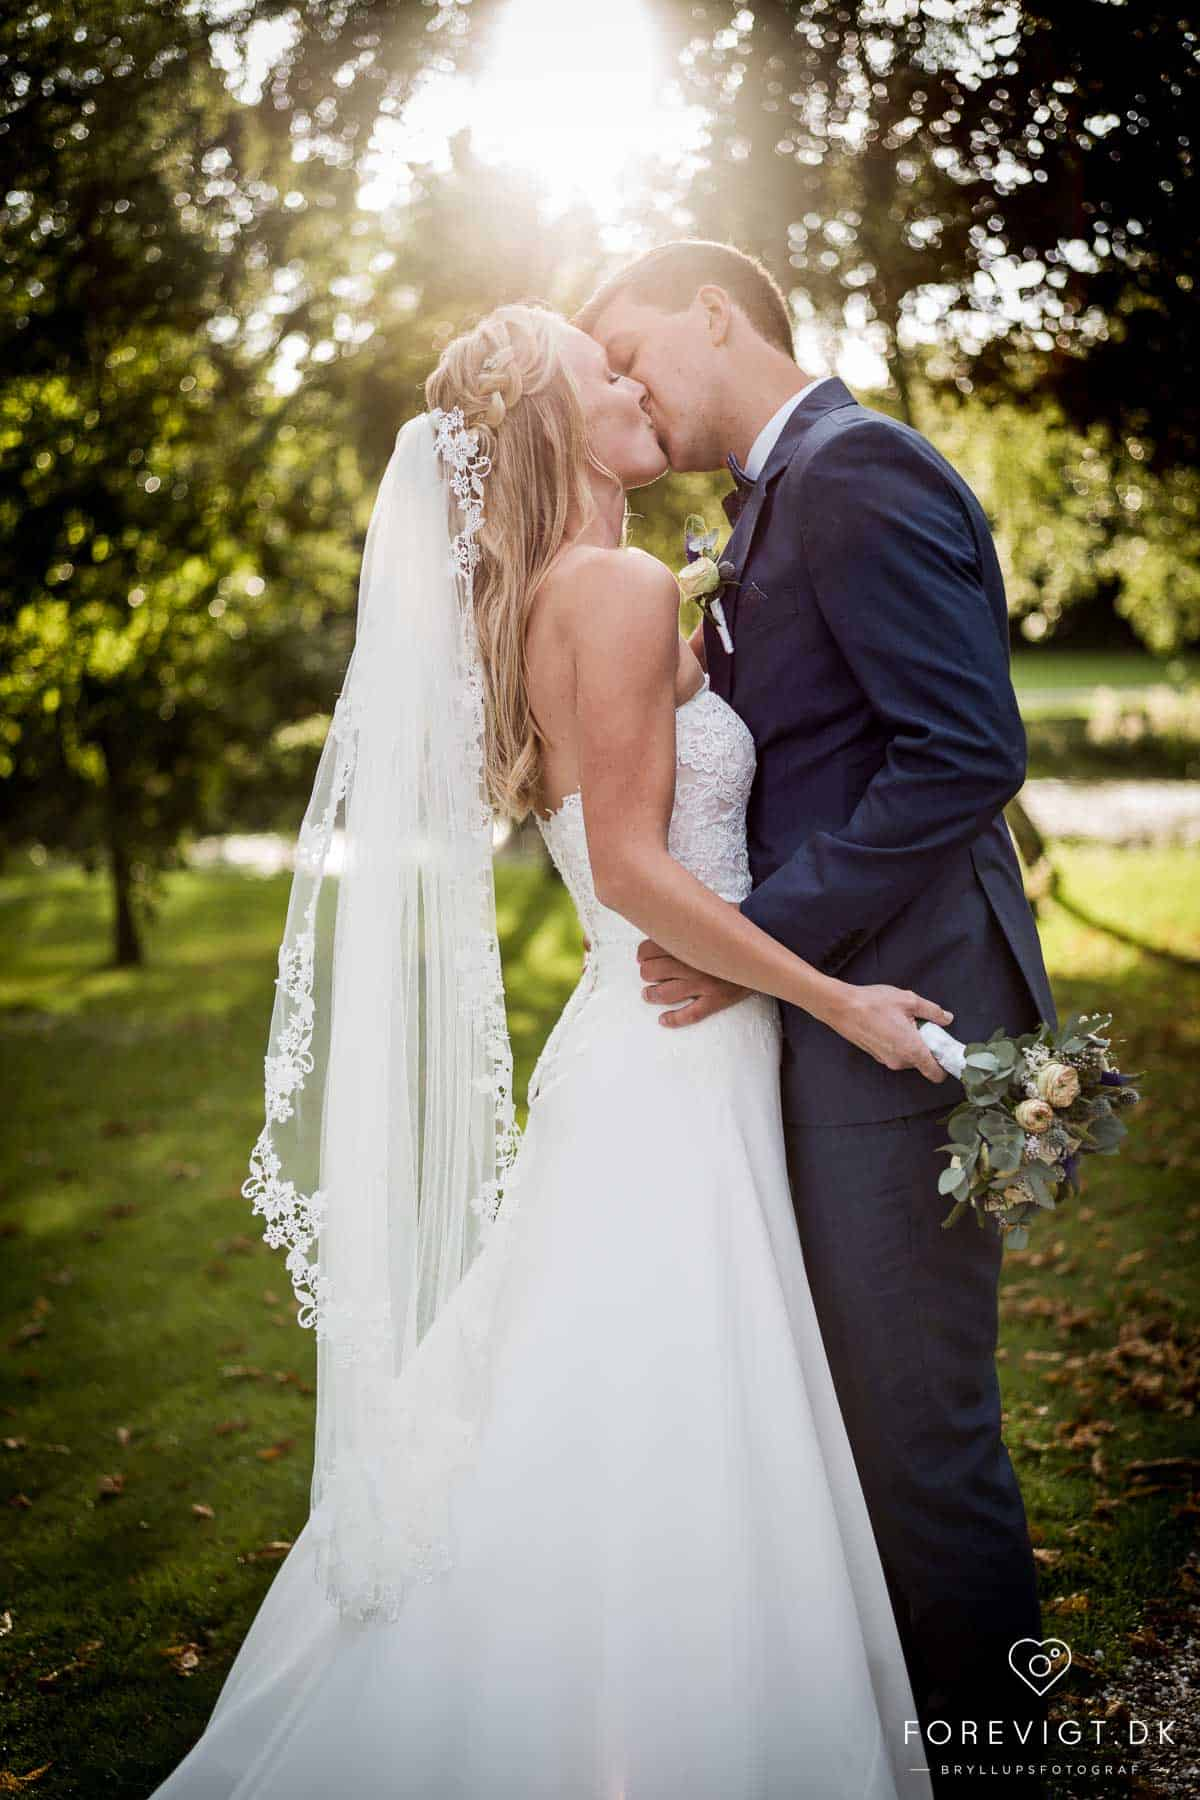 Bryllupsfotograf Dronninglund - fotografer, bryllupsbilleder, bryllupsfotografer